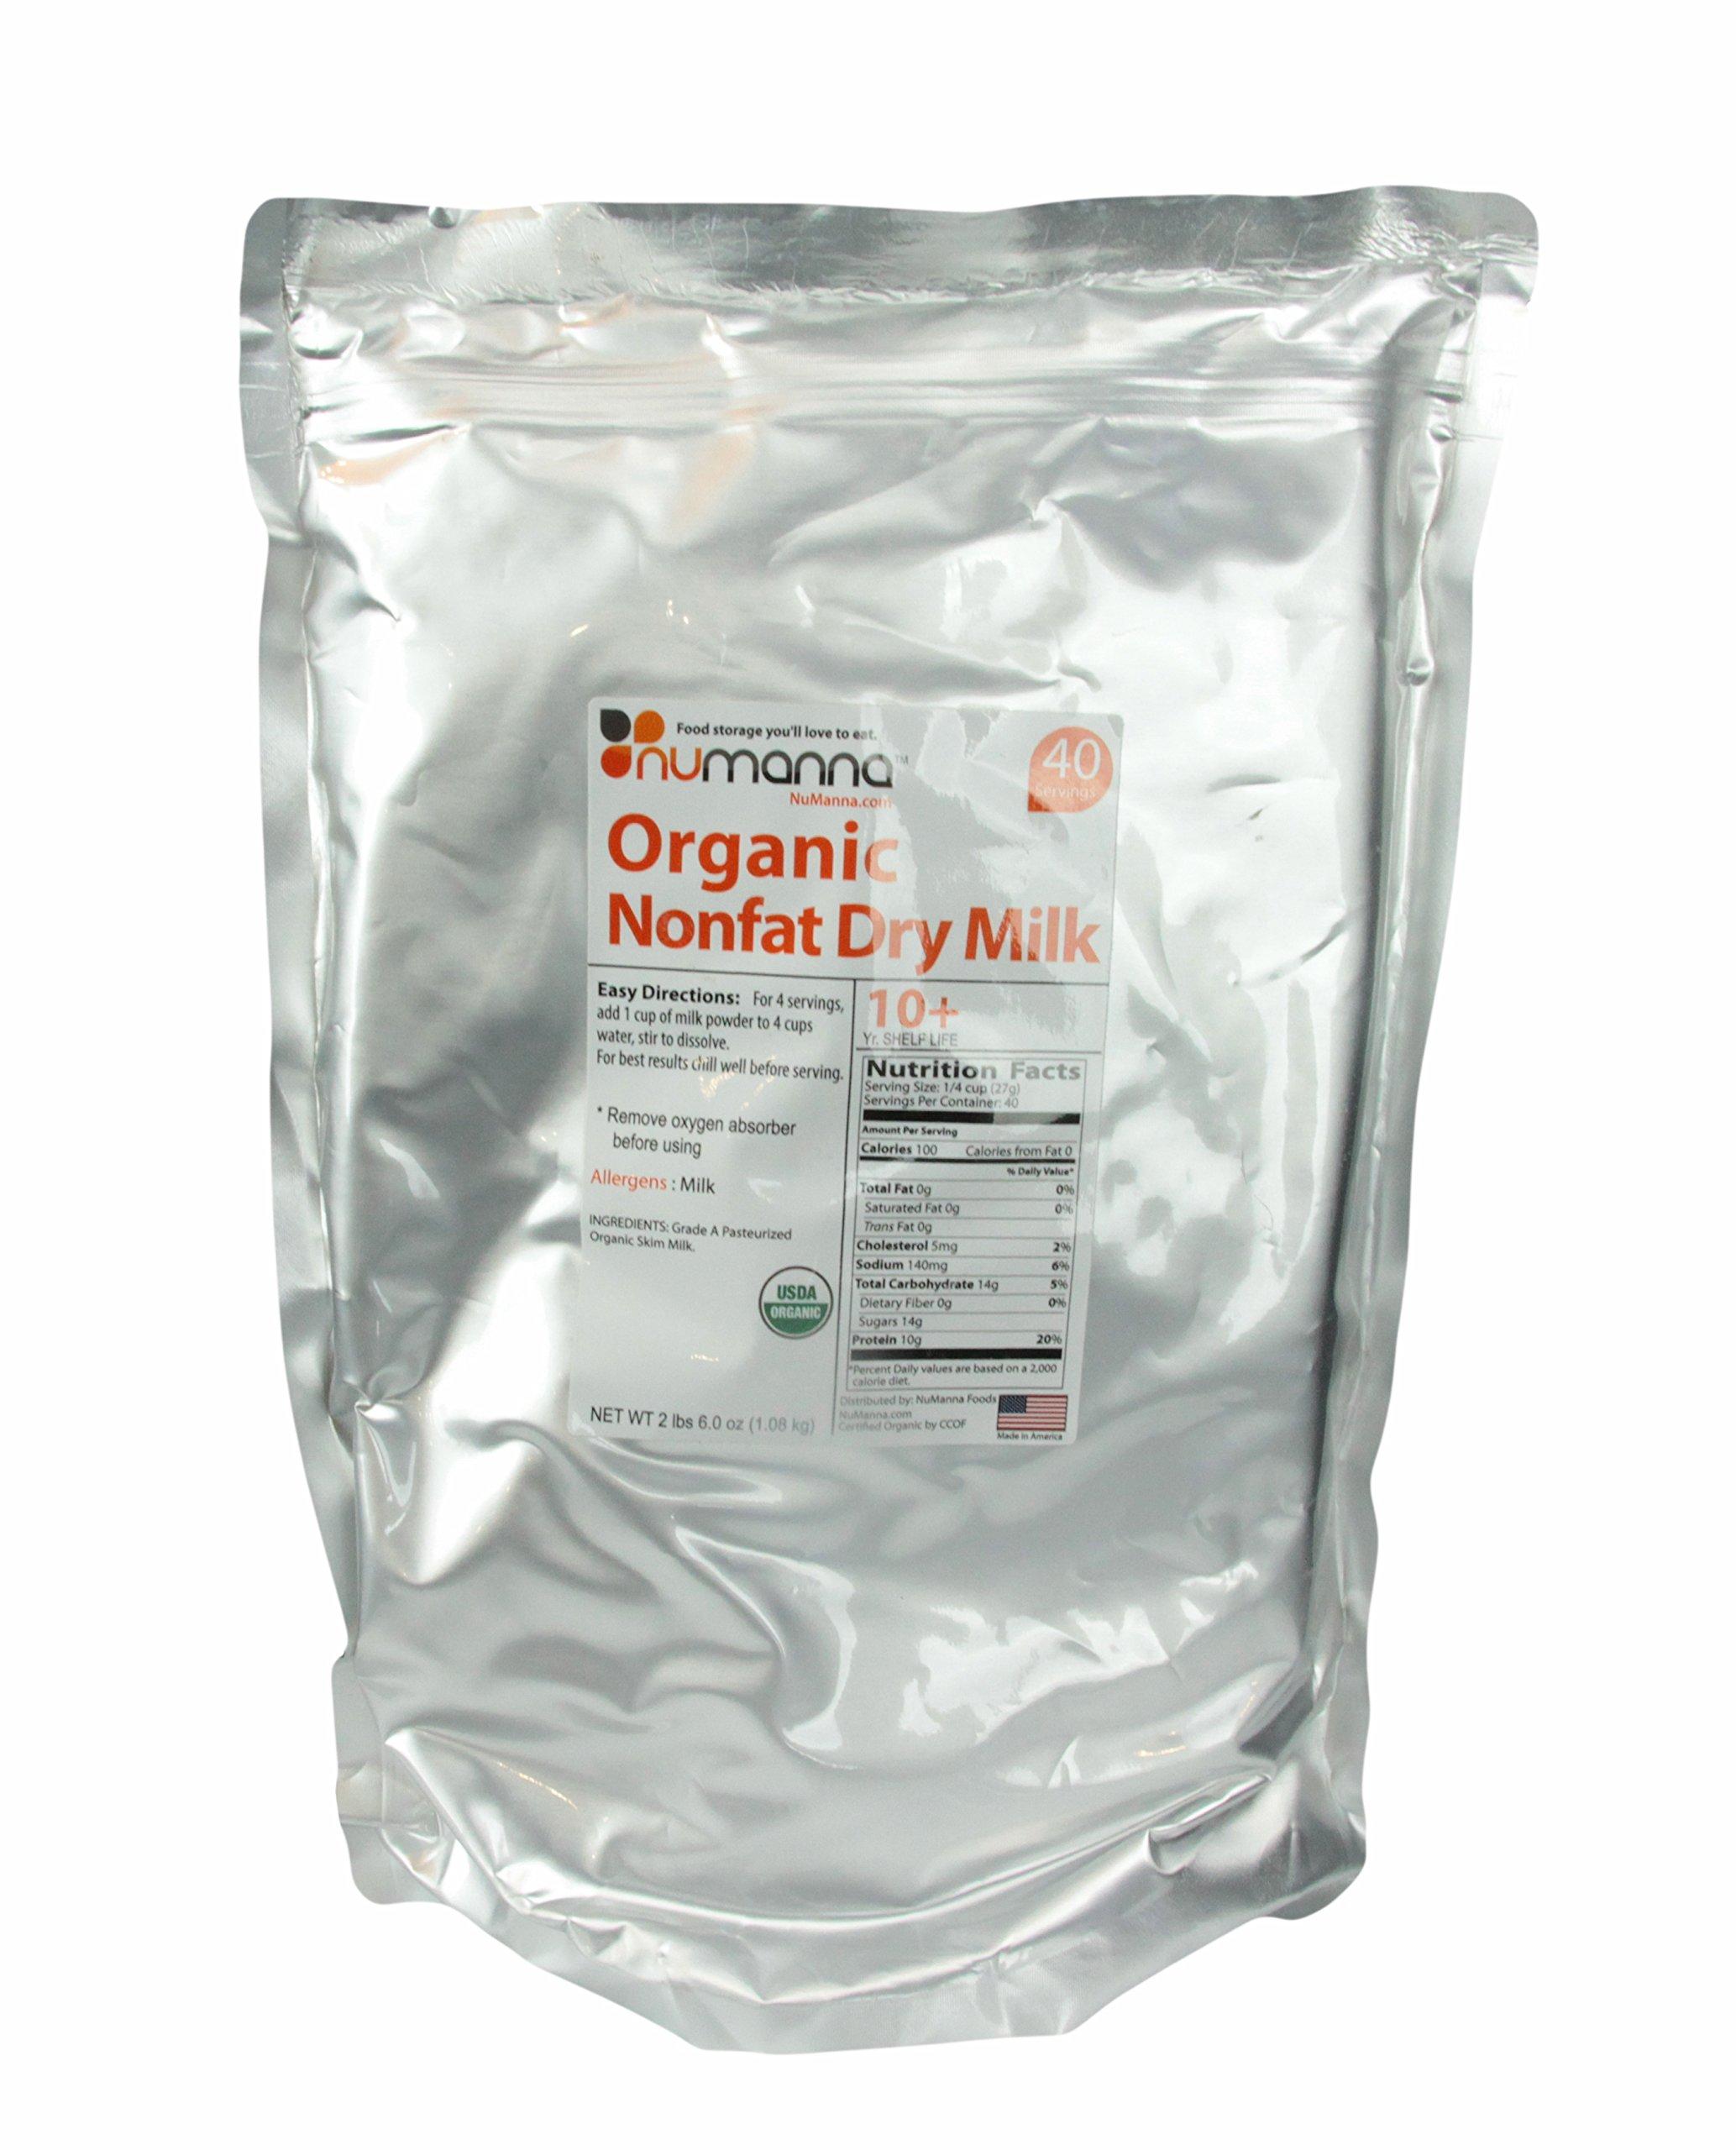 Organic Nonfat Dry Milk Powder USDA Organic 40 Serving Pouch. 10+ Shelf Life Condensed Powdered Milk